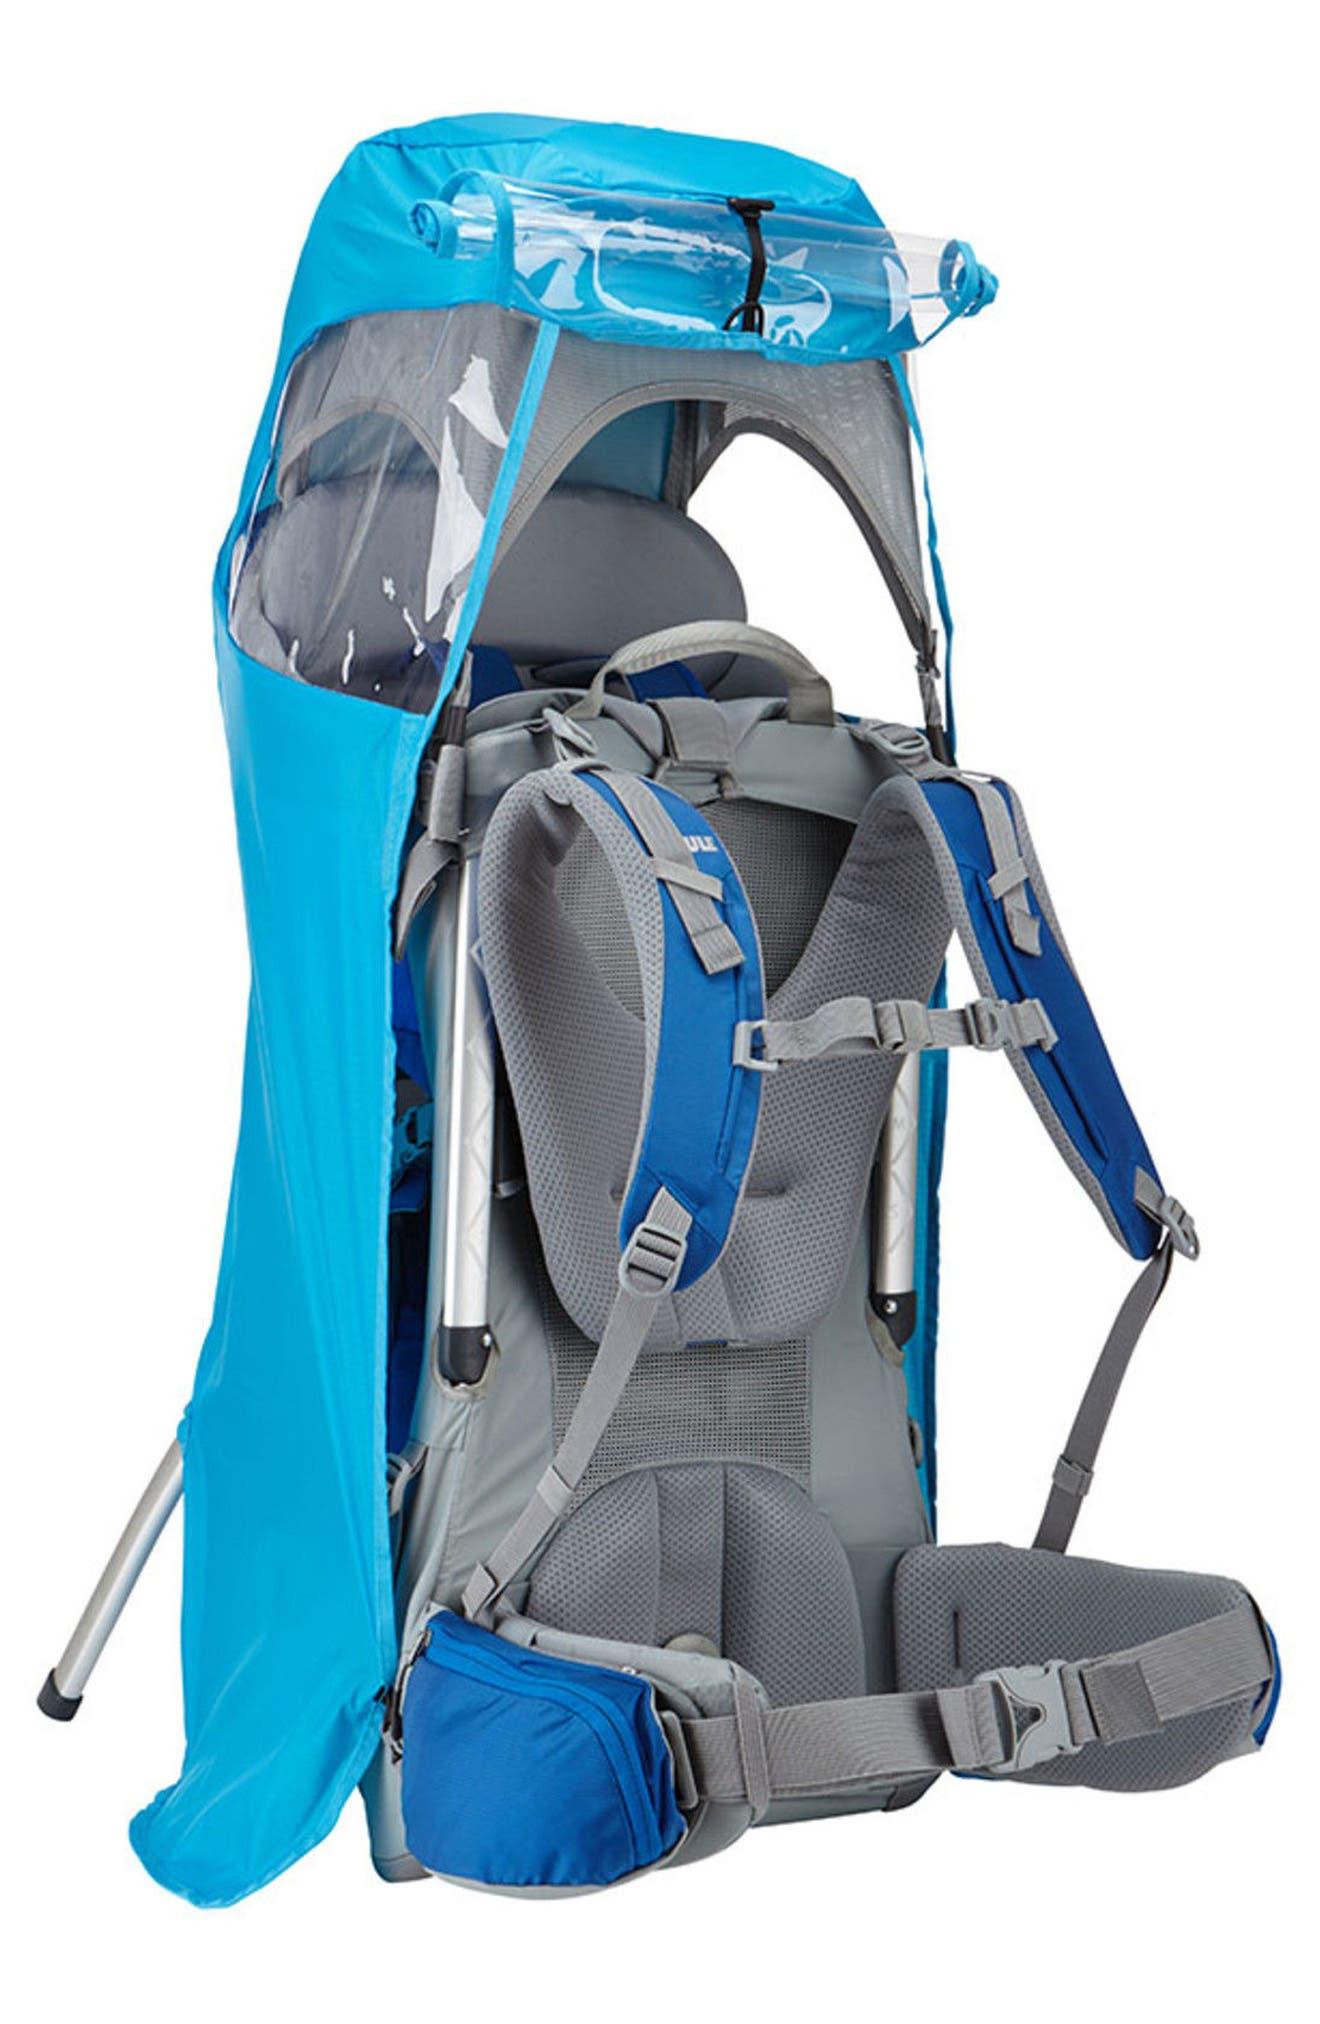 Sapling Child Carrier Rain Cover,                             Alternate thumbnail 2, color,                             THULE BLUE